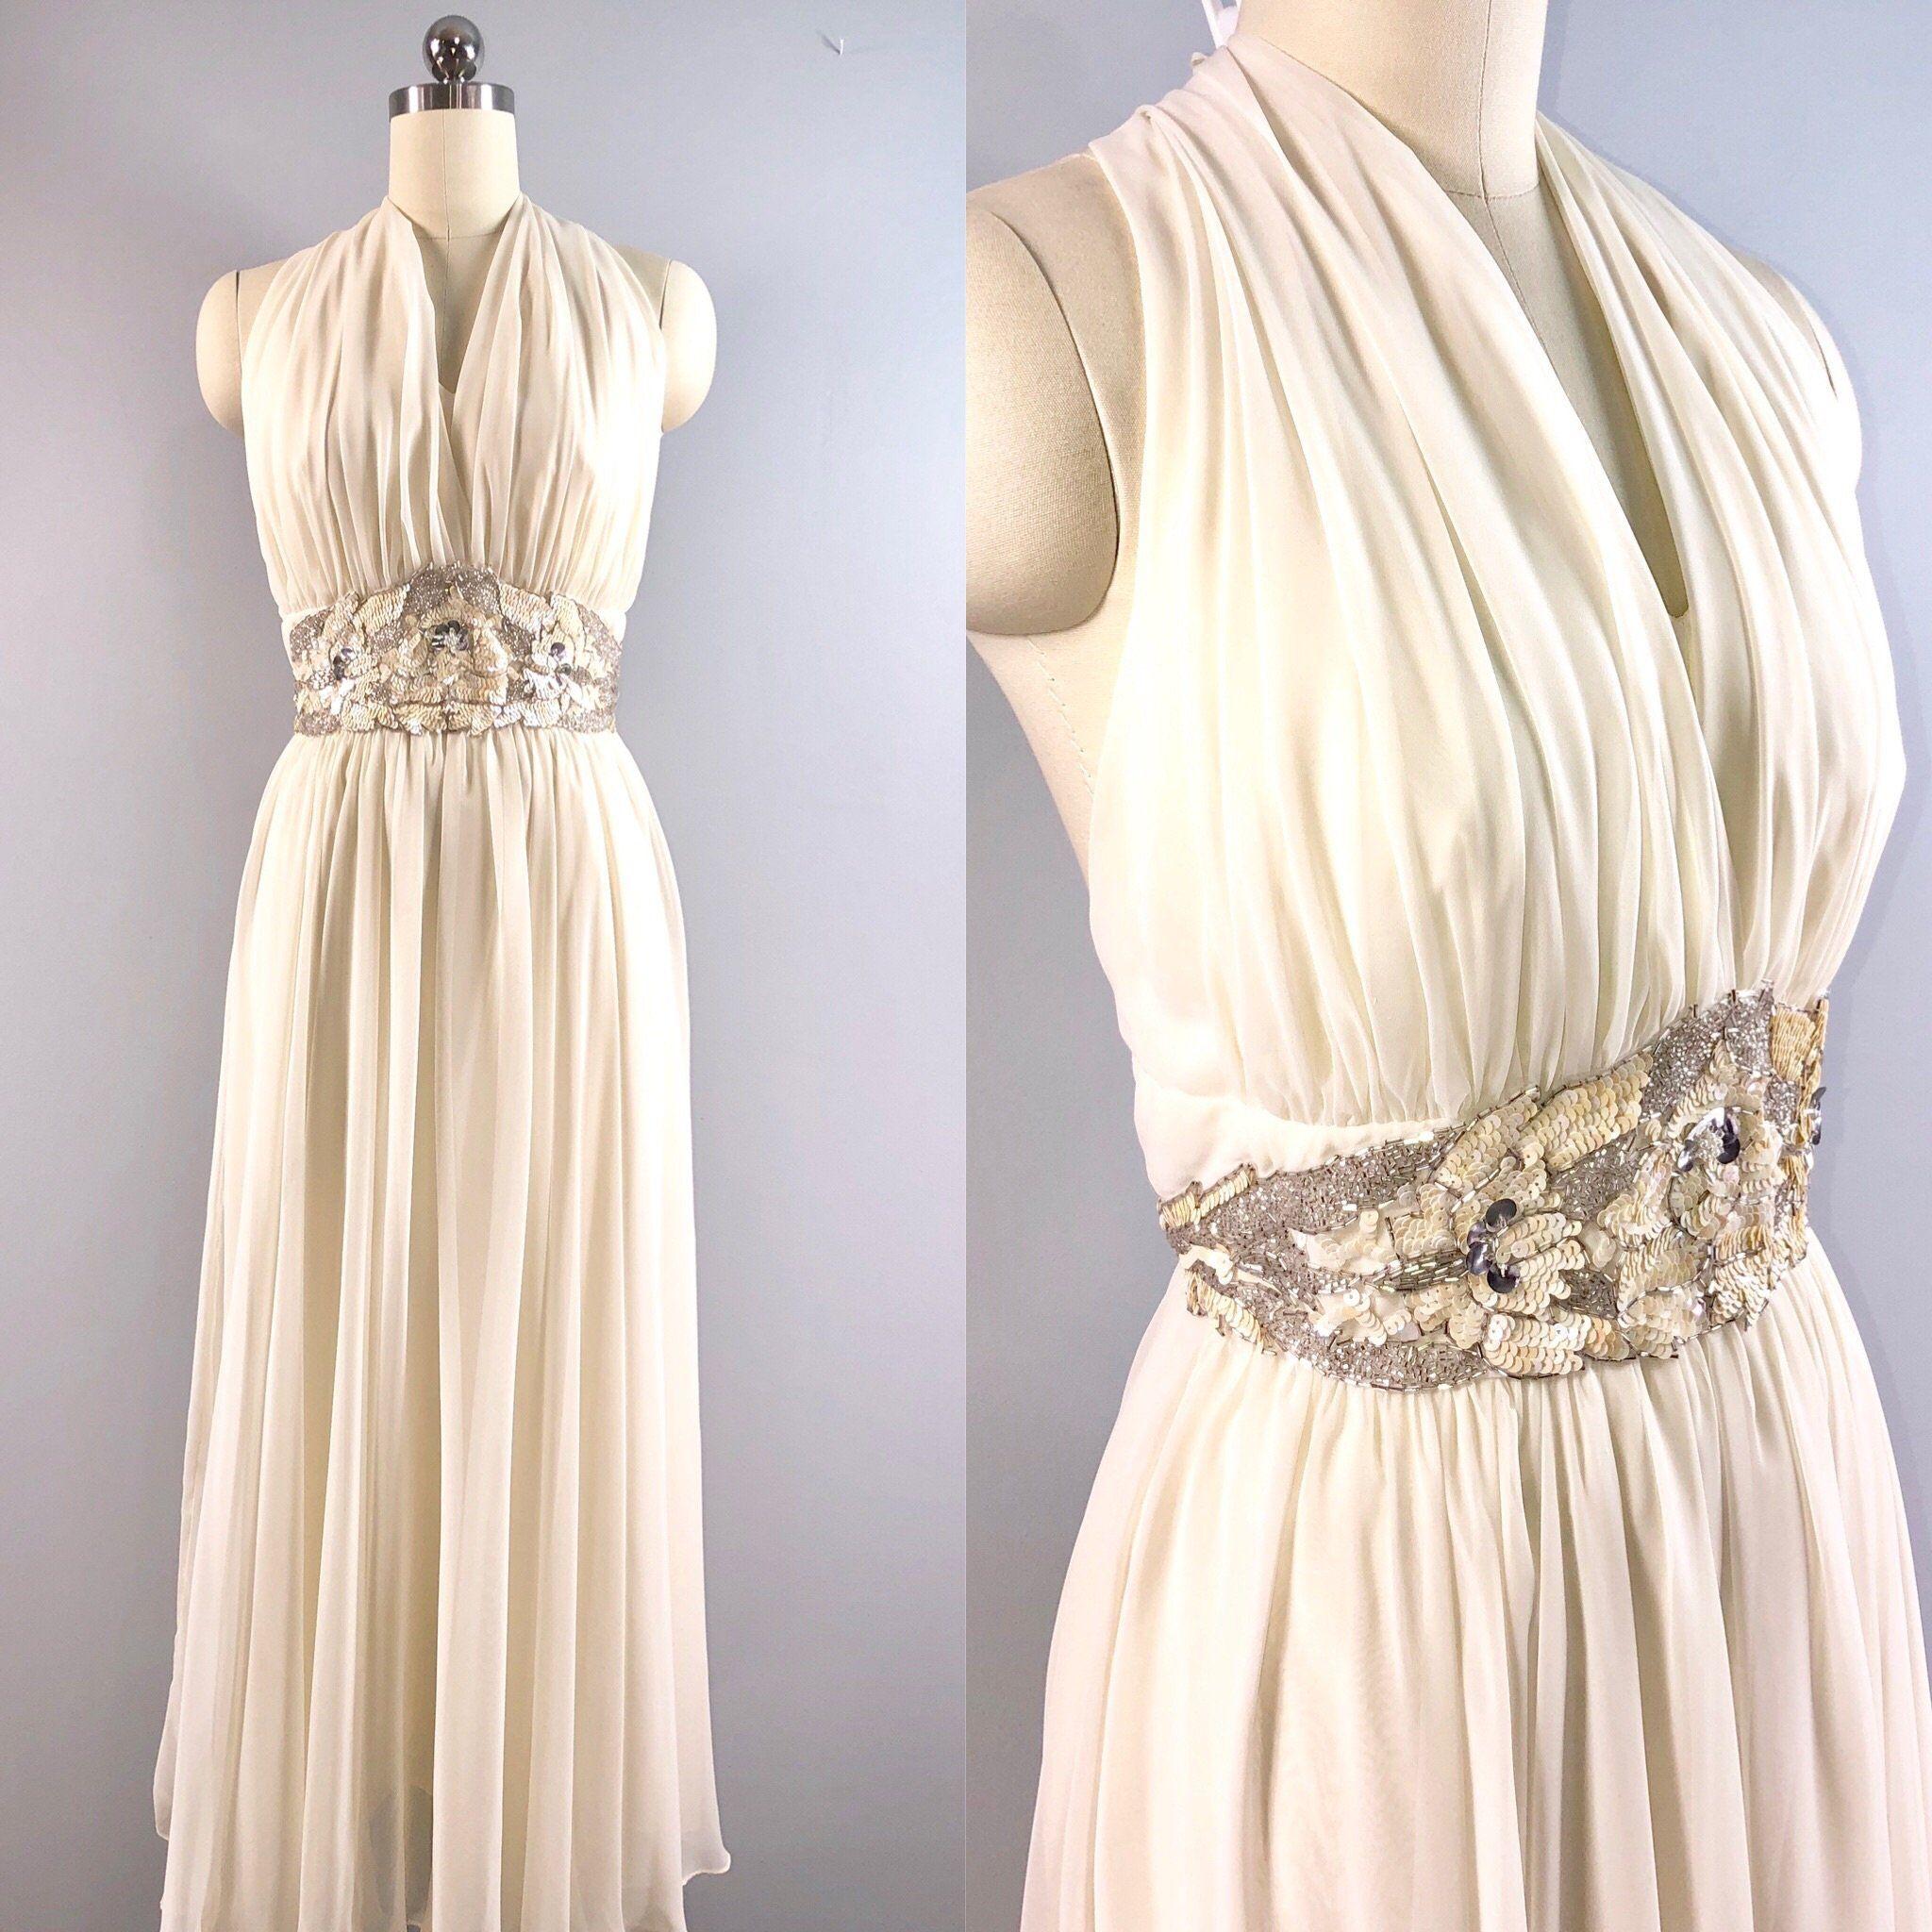 e667f5d8d04 Ursula 70s Vintage 1970s Ivory Chiffon Halter Cocktail Dress Wedding Formal  34 bust